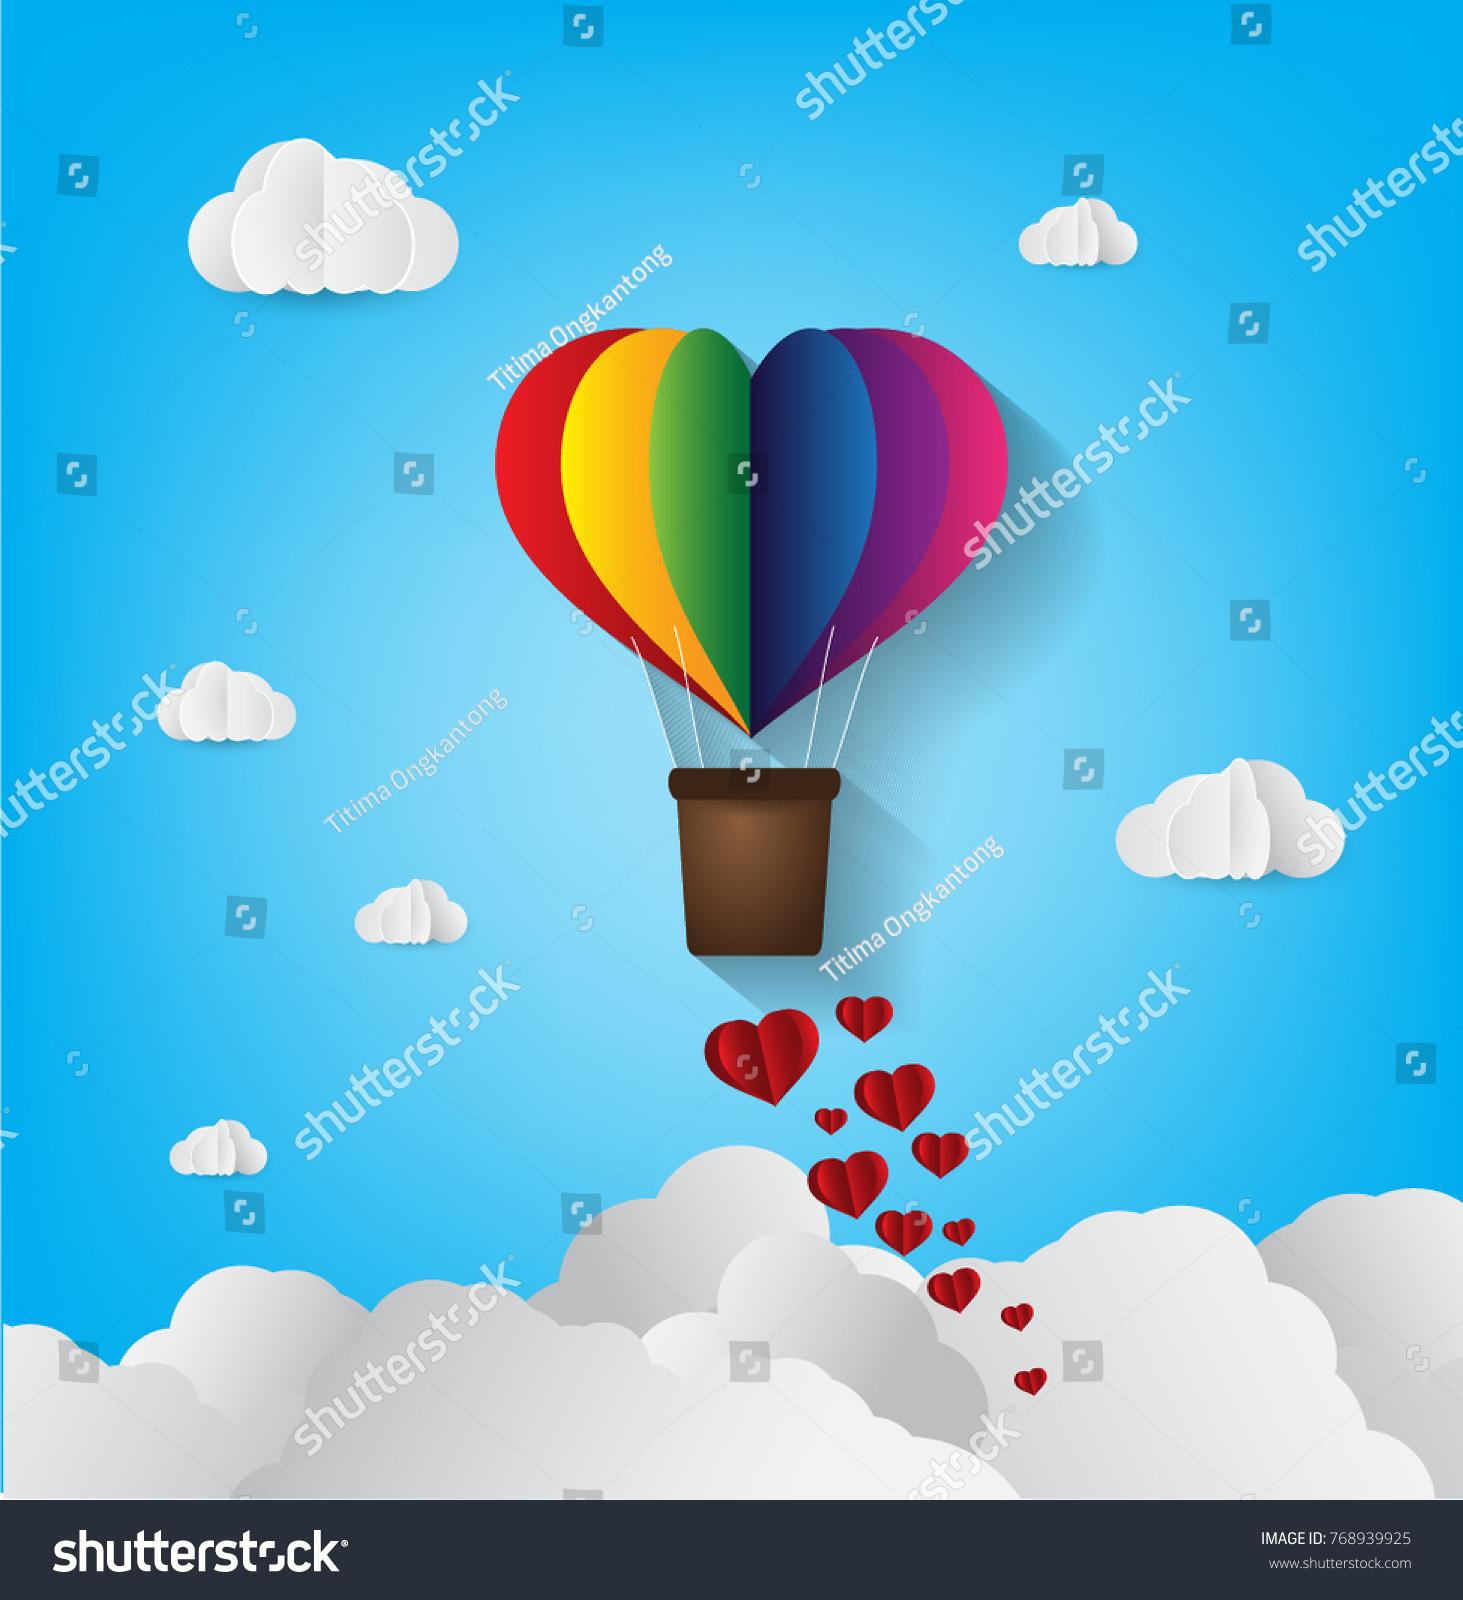 Origami made hot air balloon heart stock vector 768939925 origami made hot air balloon in a heart shape paper art style jeuxipadfo Choice Image